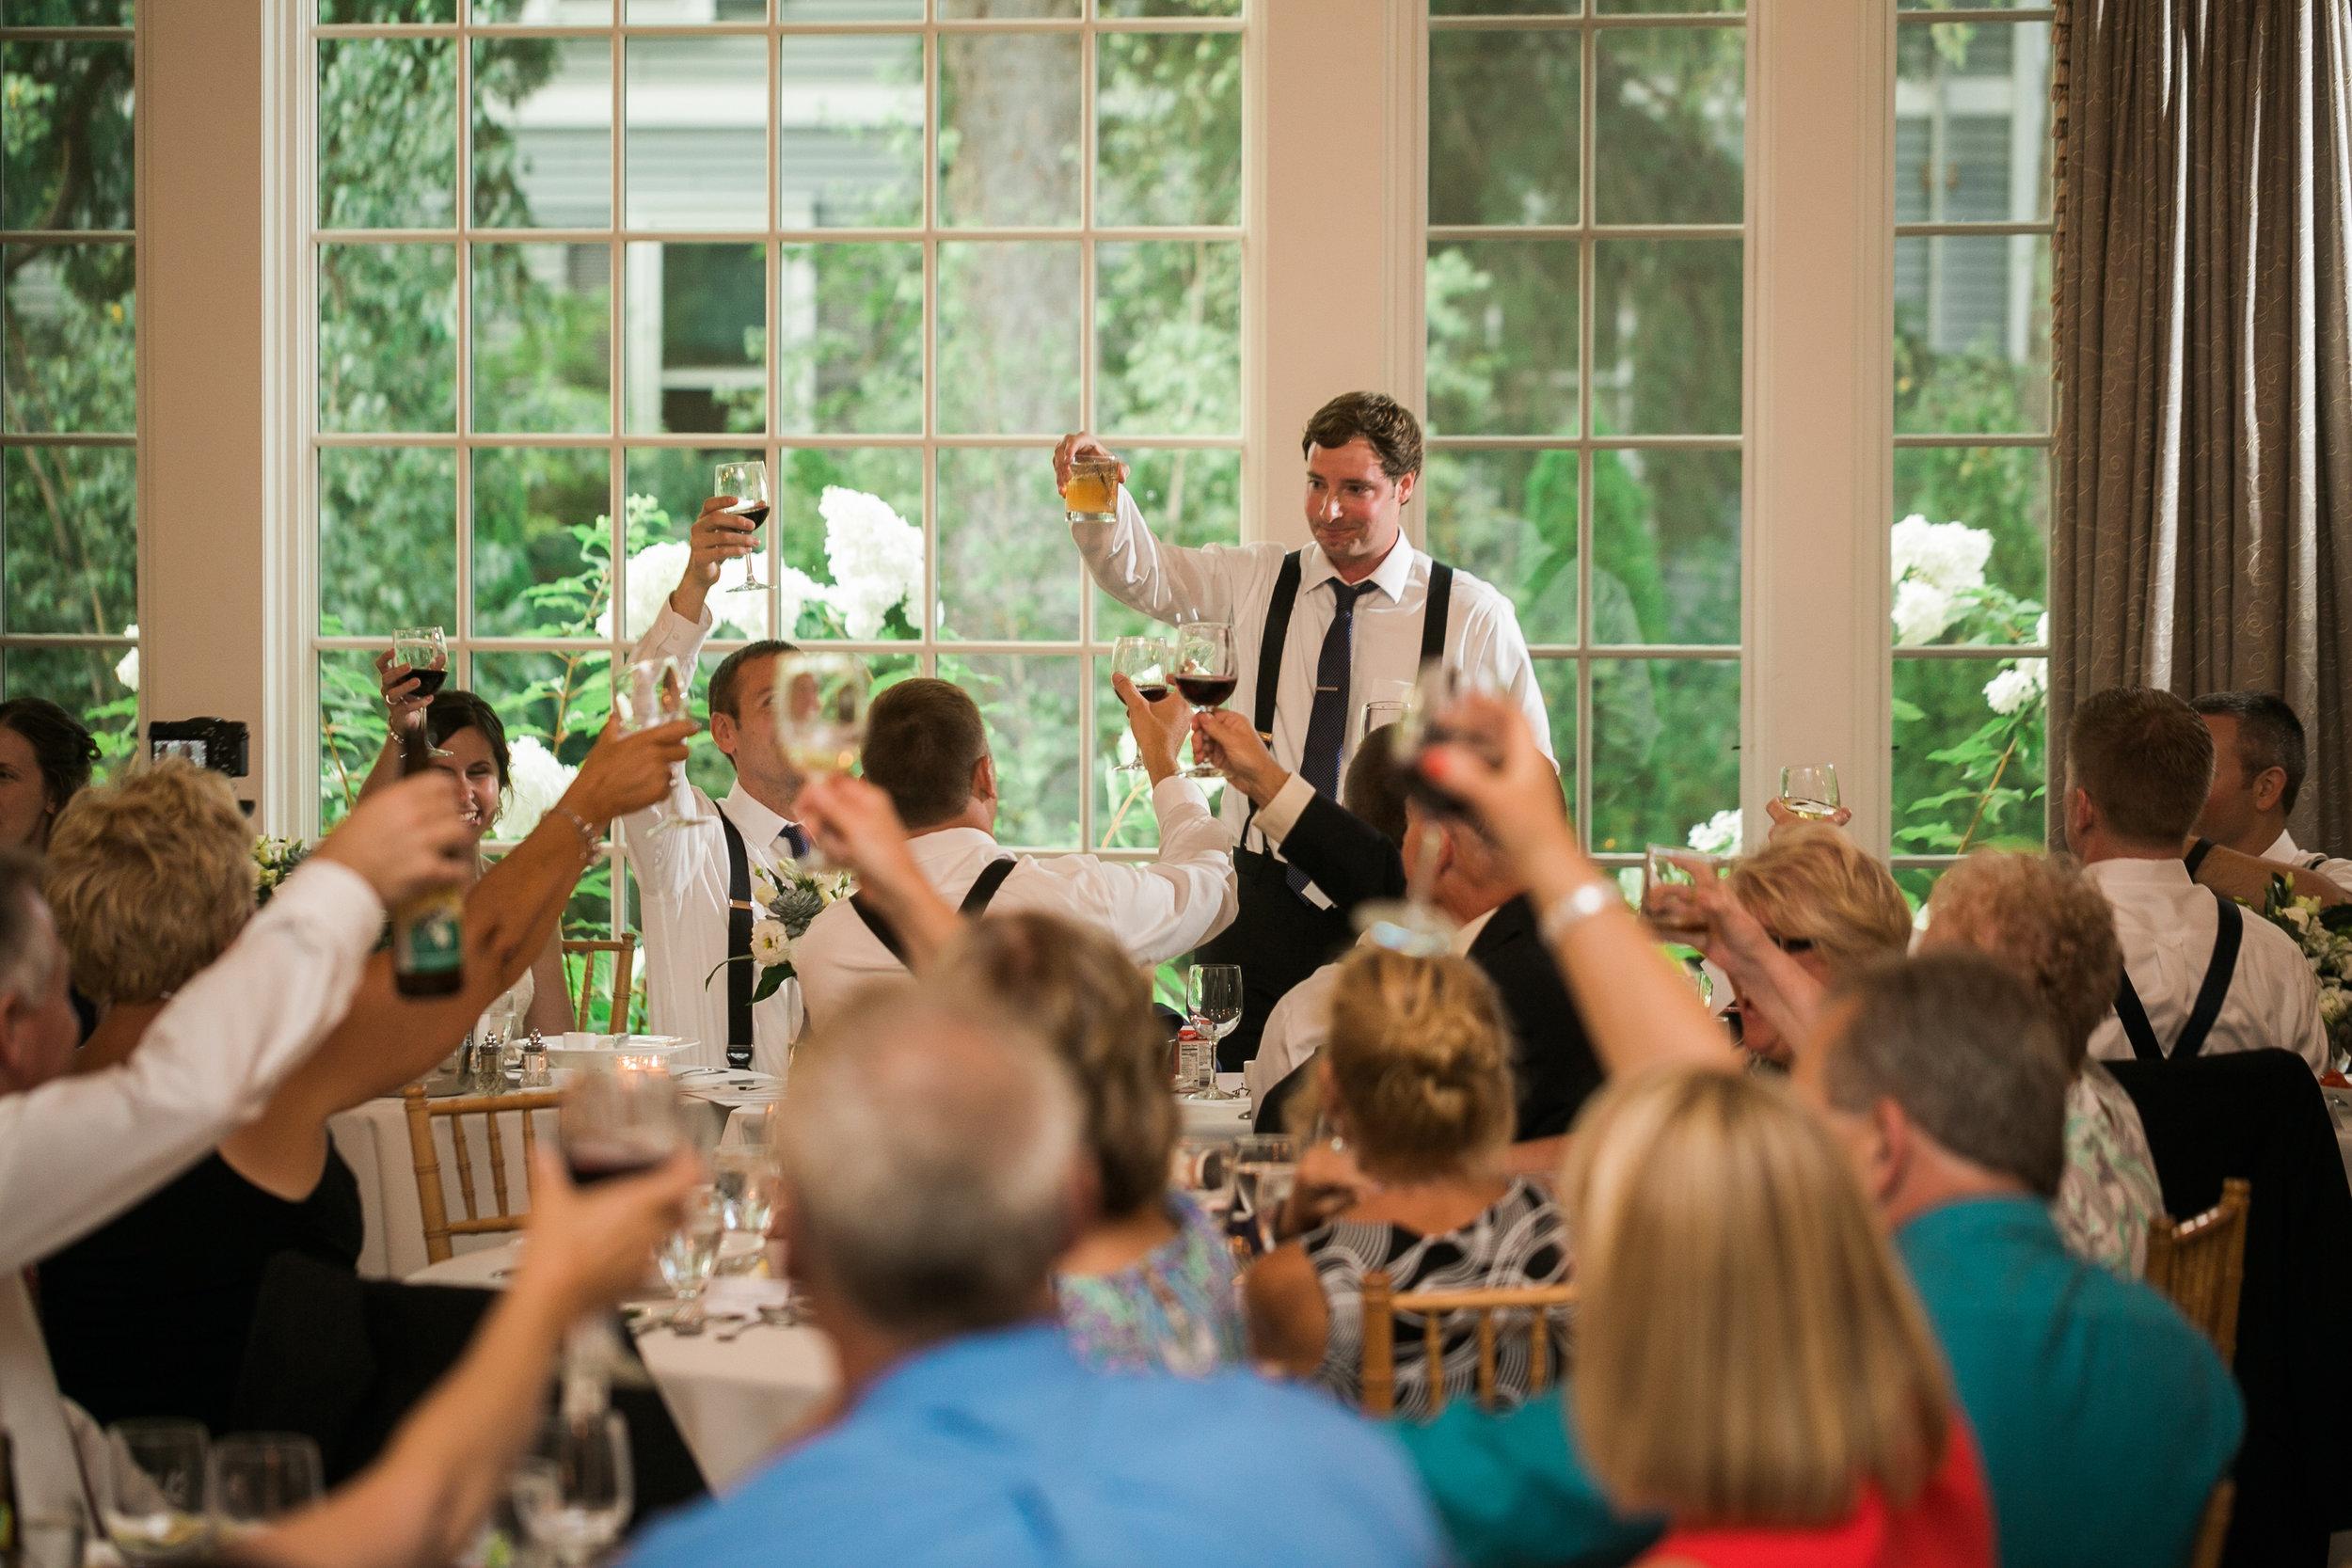 wisconsin-wedding-acowsay-uttke-photography-61.jpg